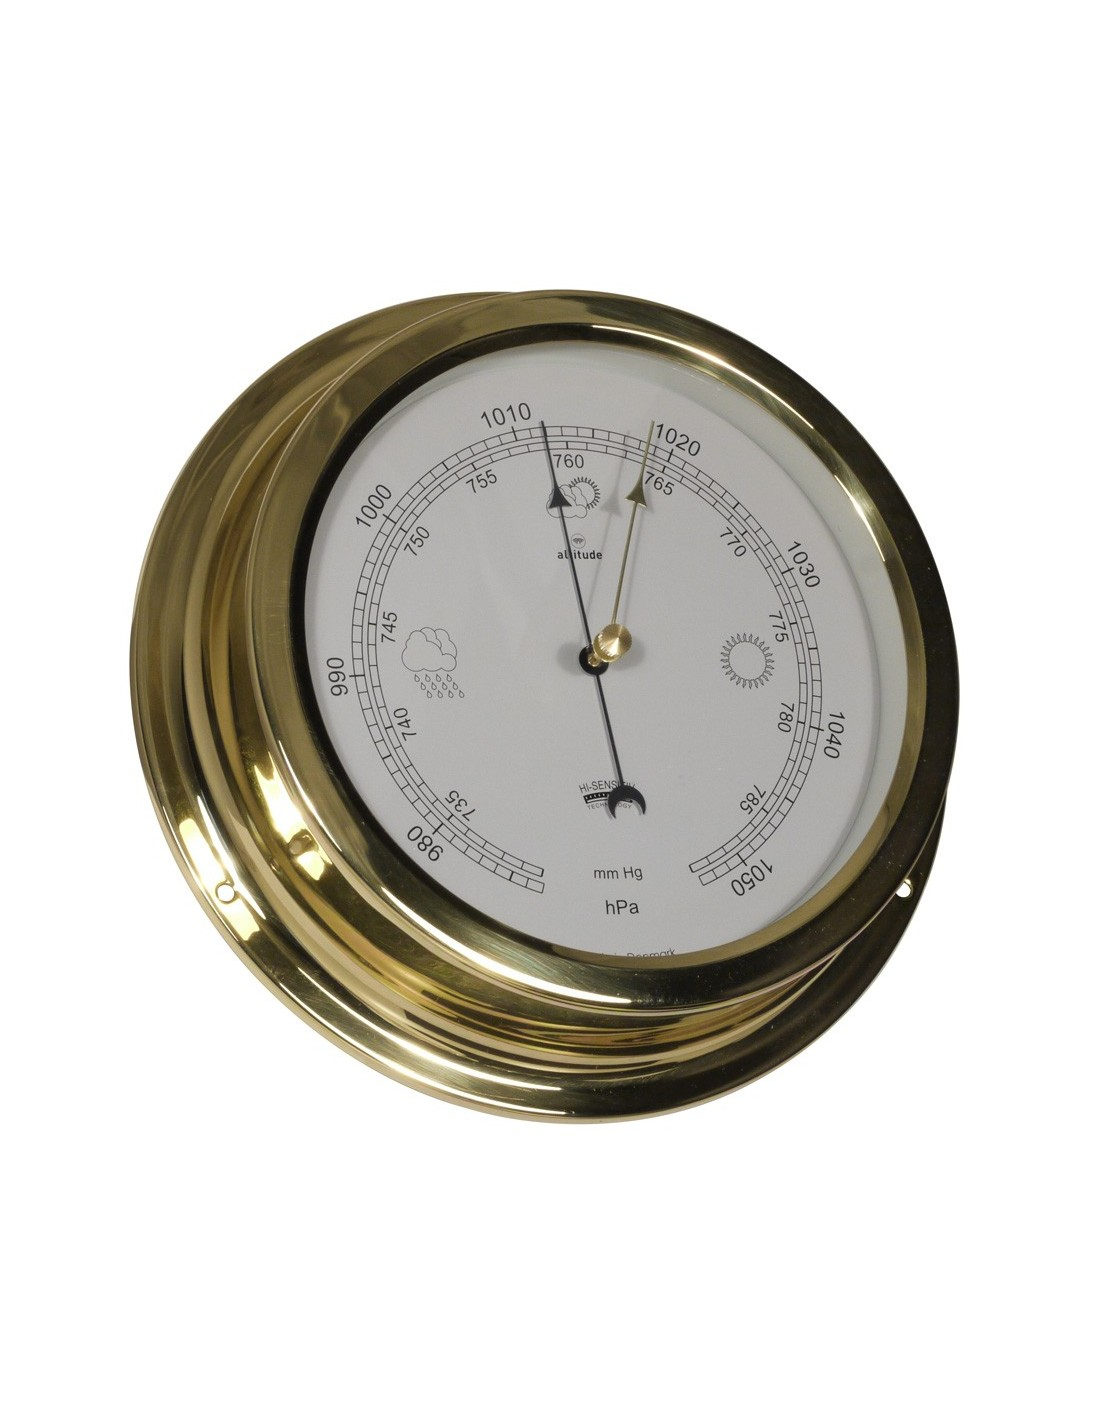 Barometer - 224 mm